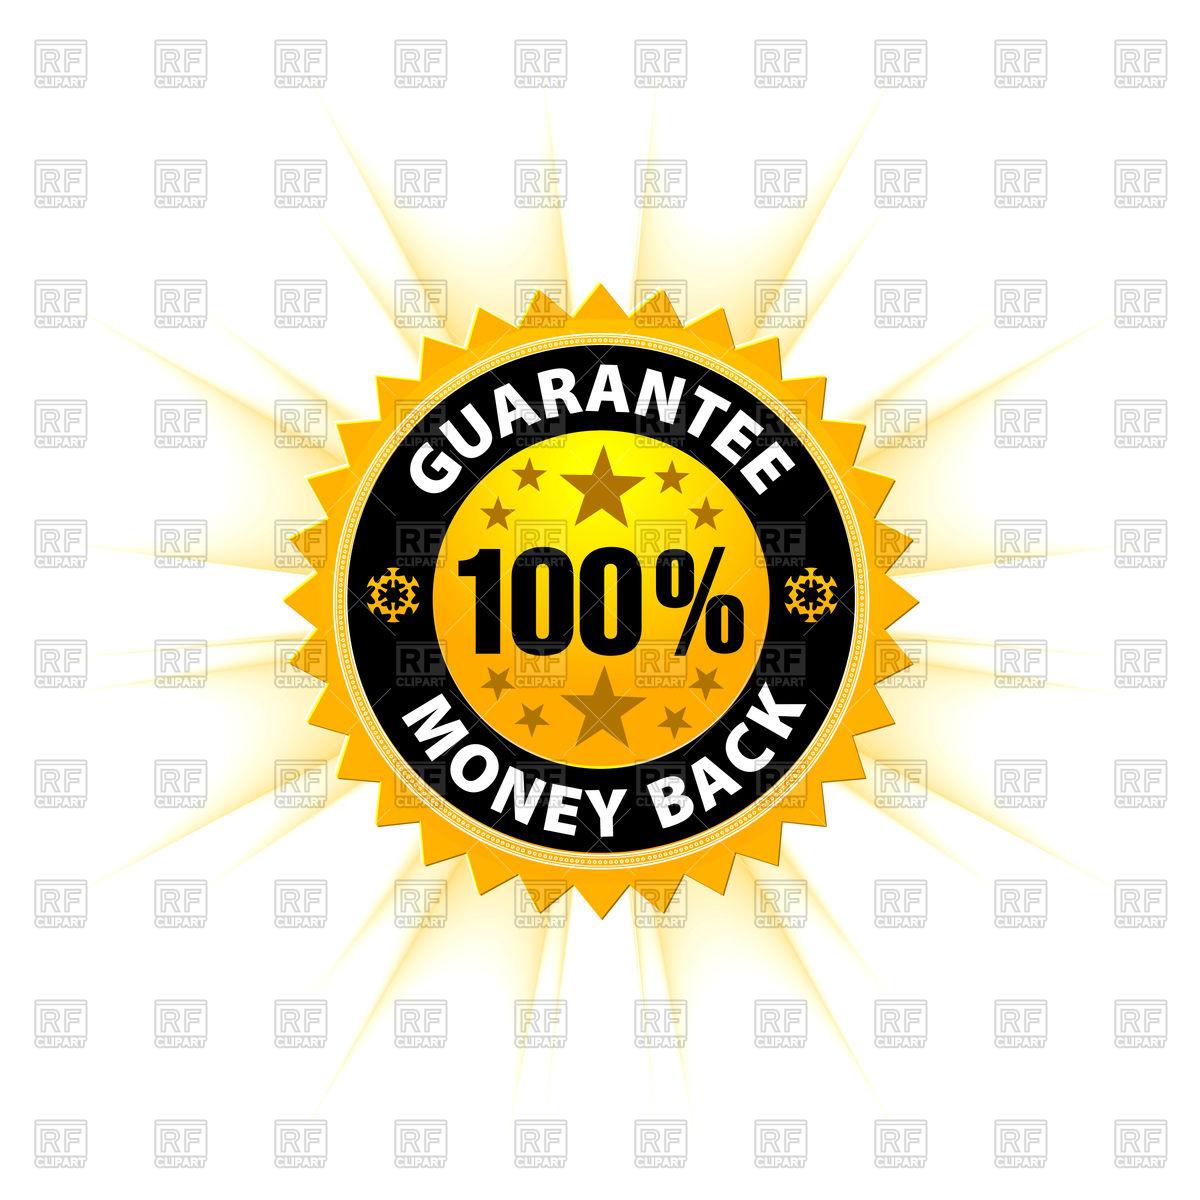 1200x1200 Money Back Guarantee Icon Vector Image Vector Artwork Of Signs